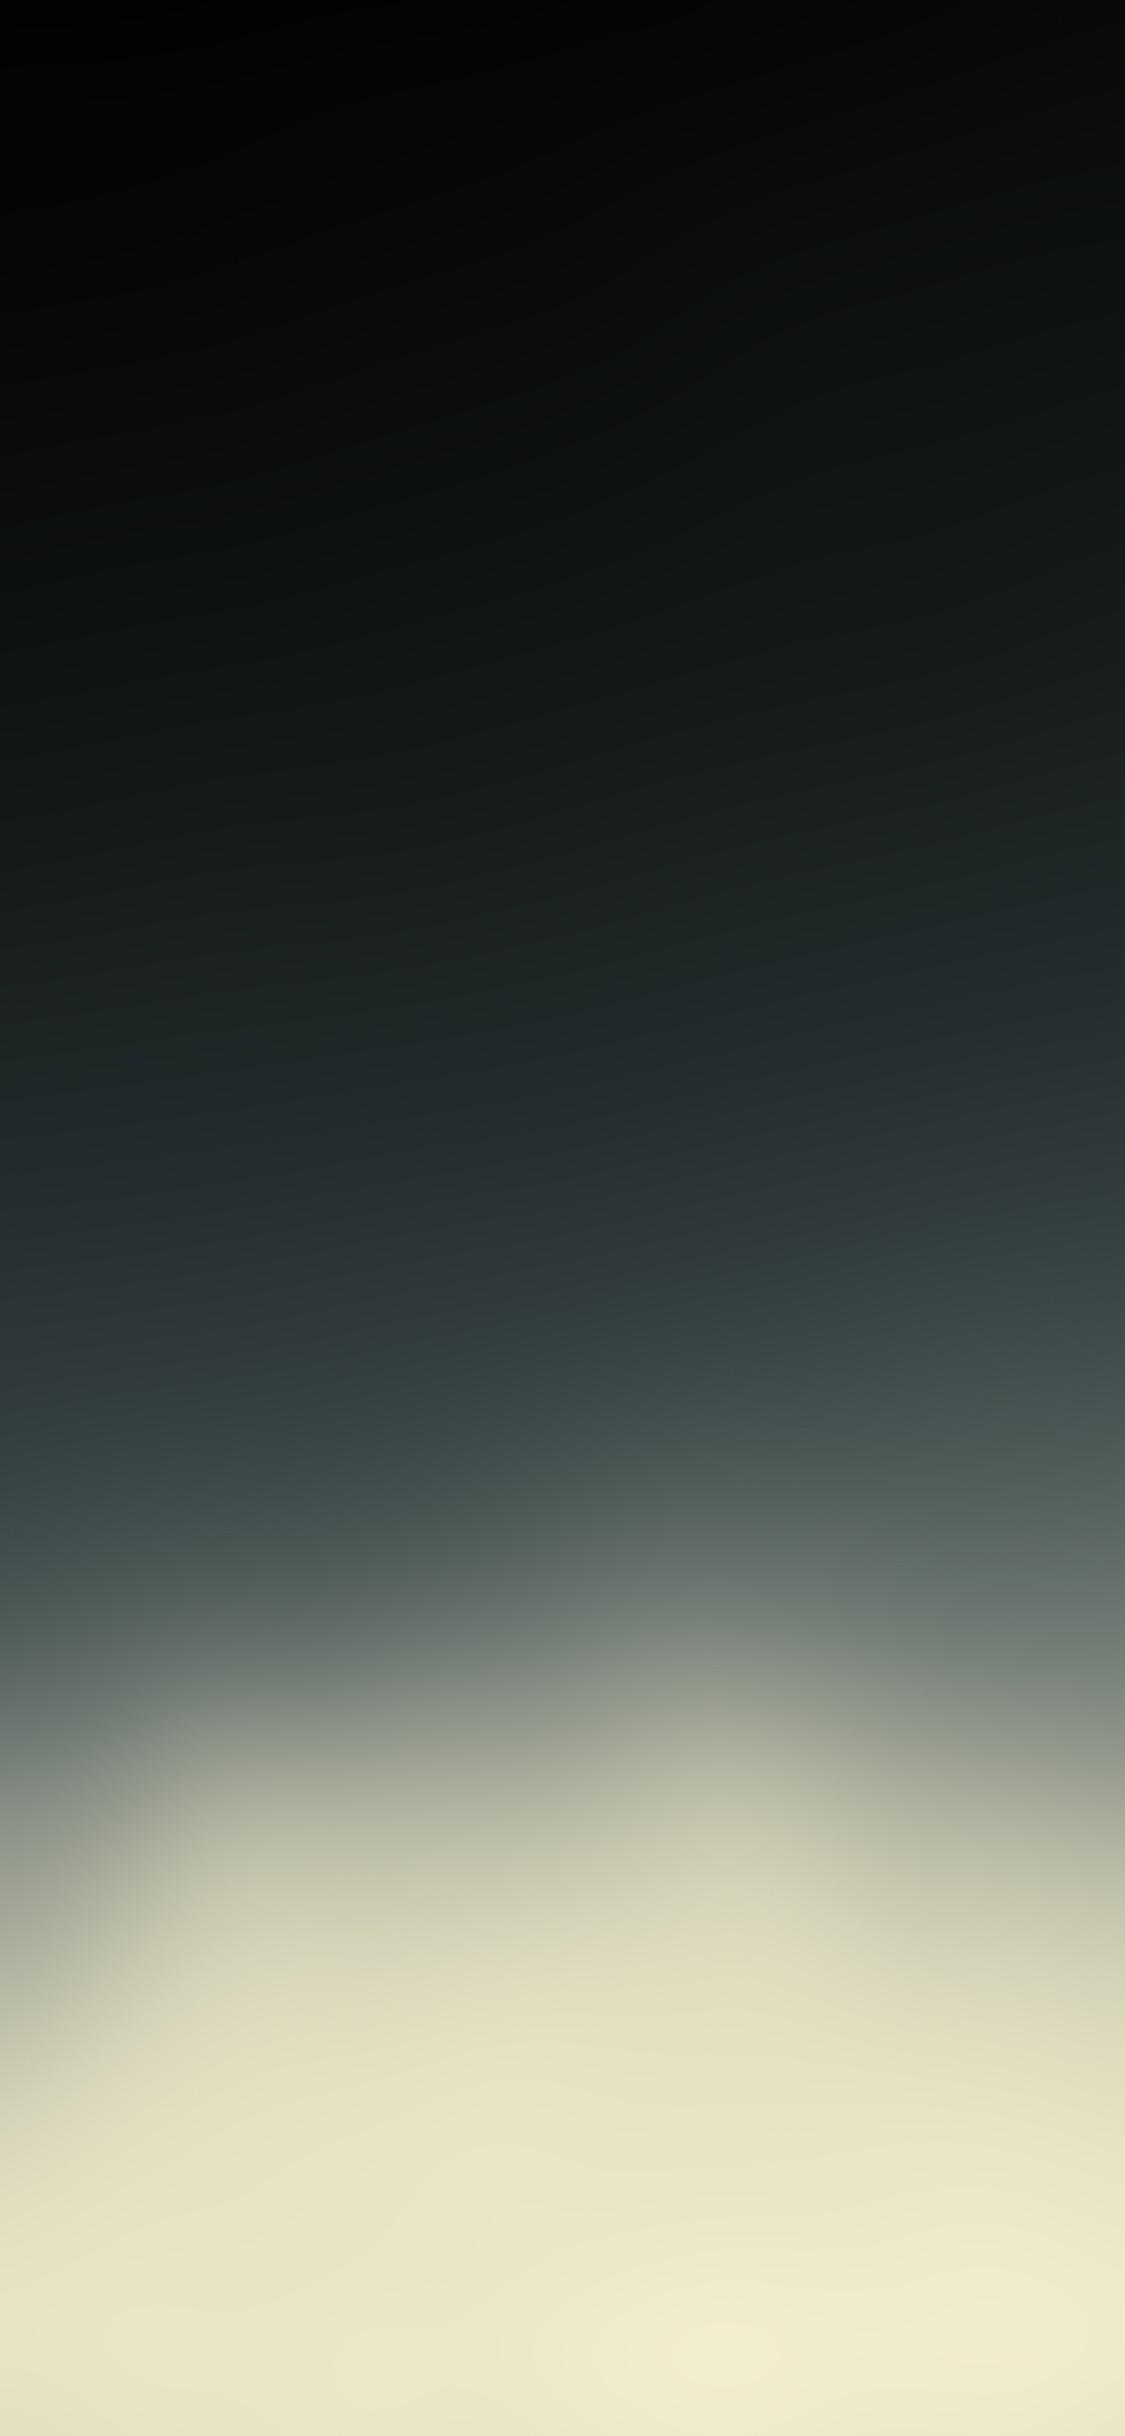 iPhoneXpapers.com-Apple-iPhone-wallpaper-sk71-green-dark-soft-night-blur-gradation